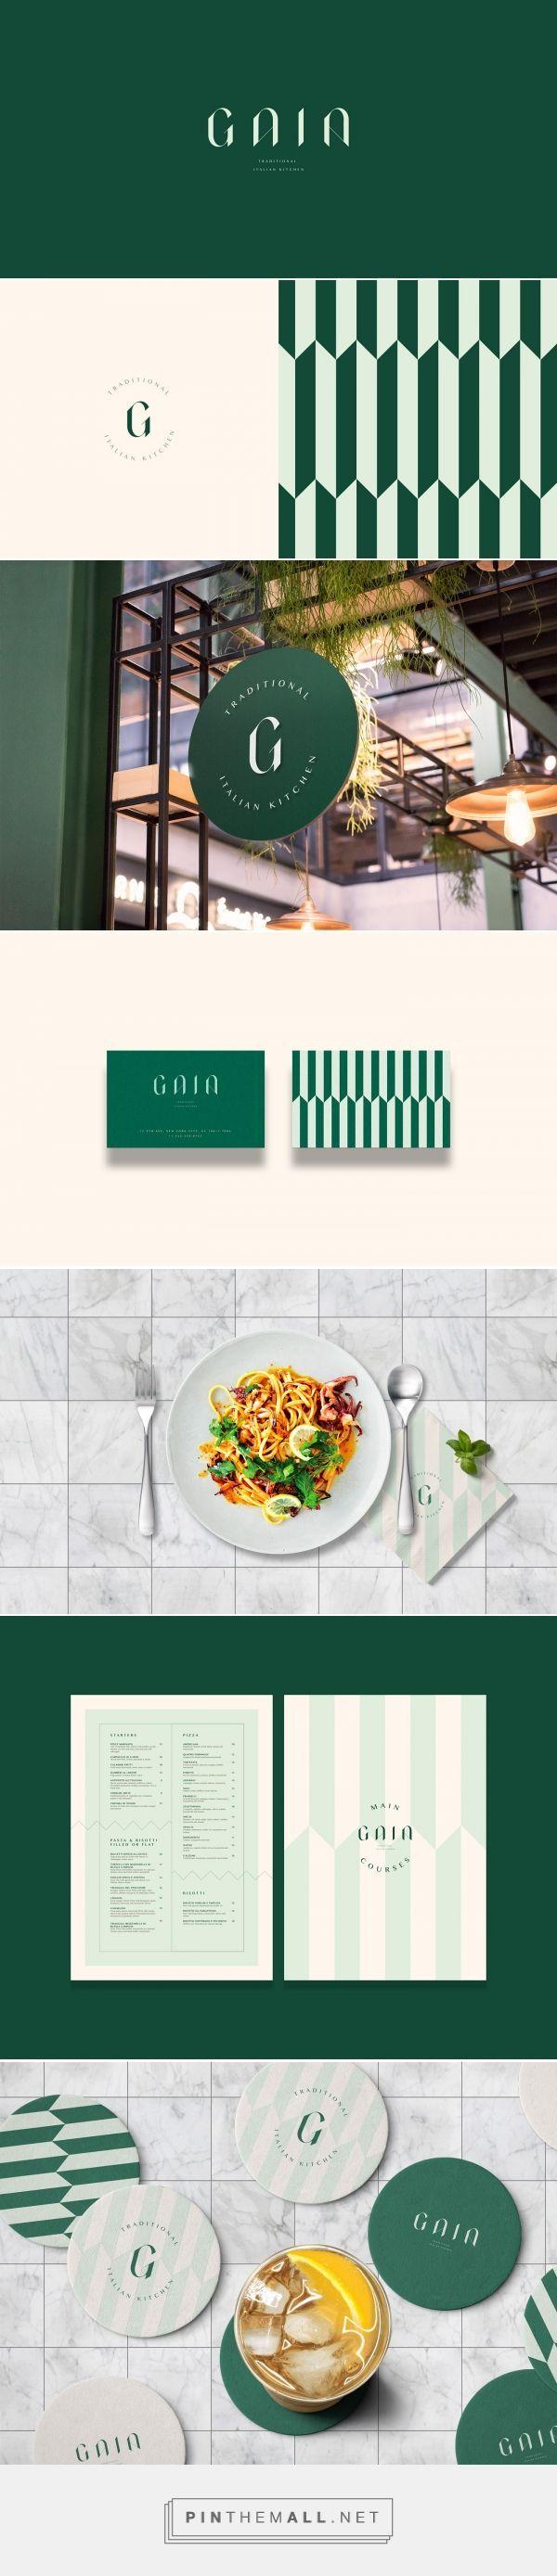 Gaia Traditional Italian Restaurant